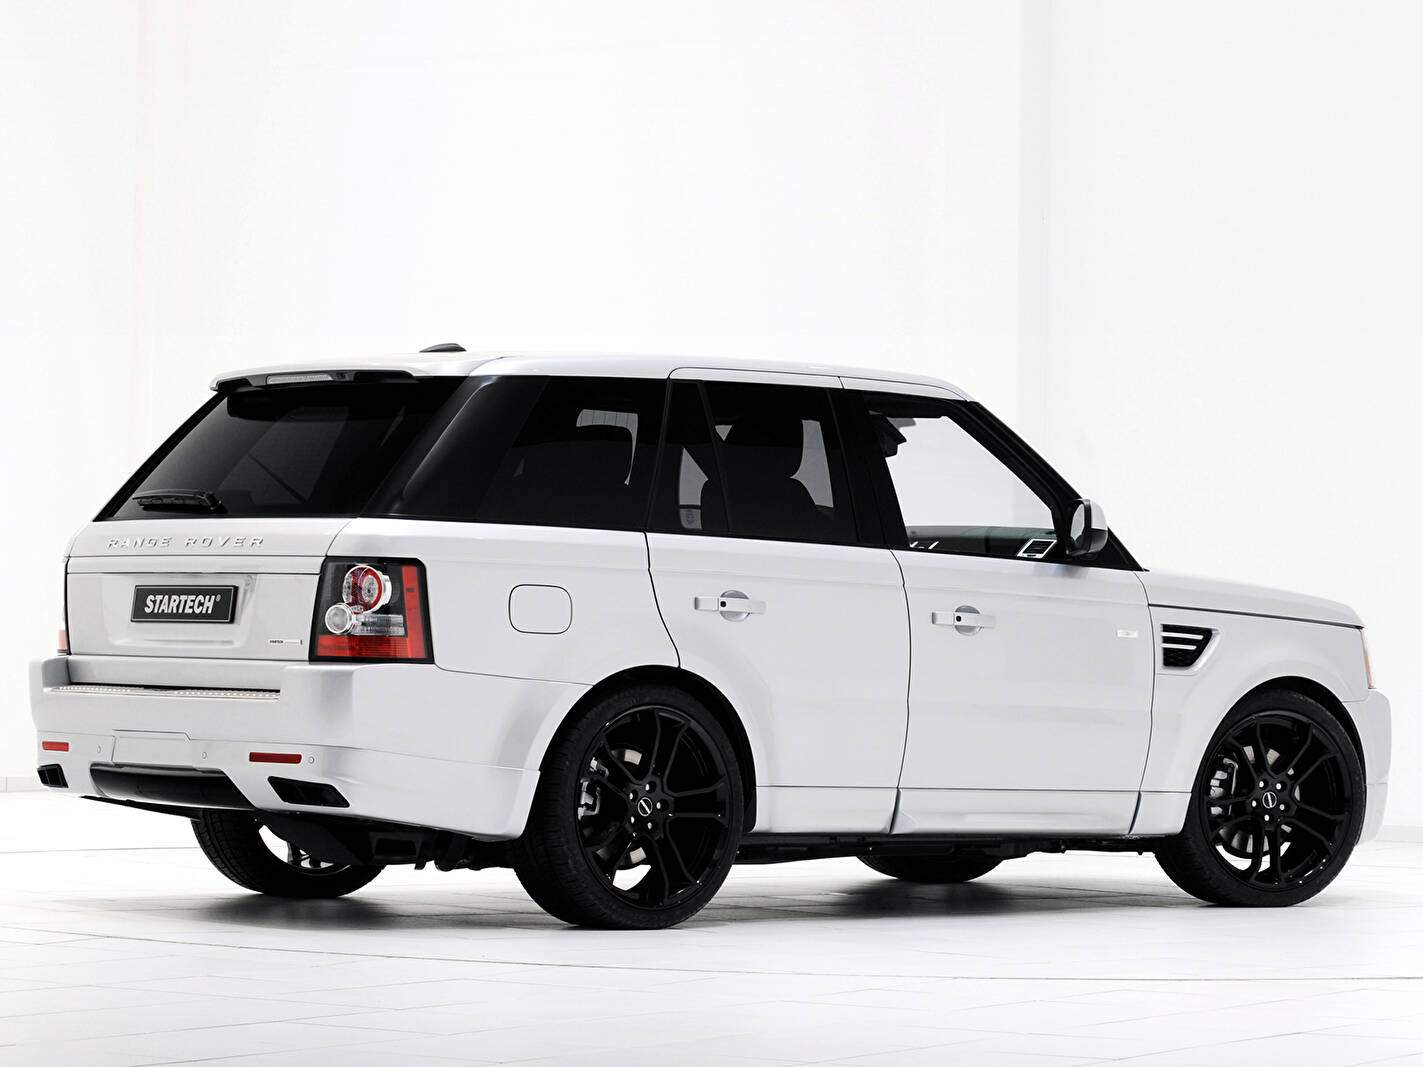 Startech Range Rover Sport (2009-2013),  ajouté par fox58